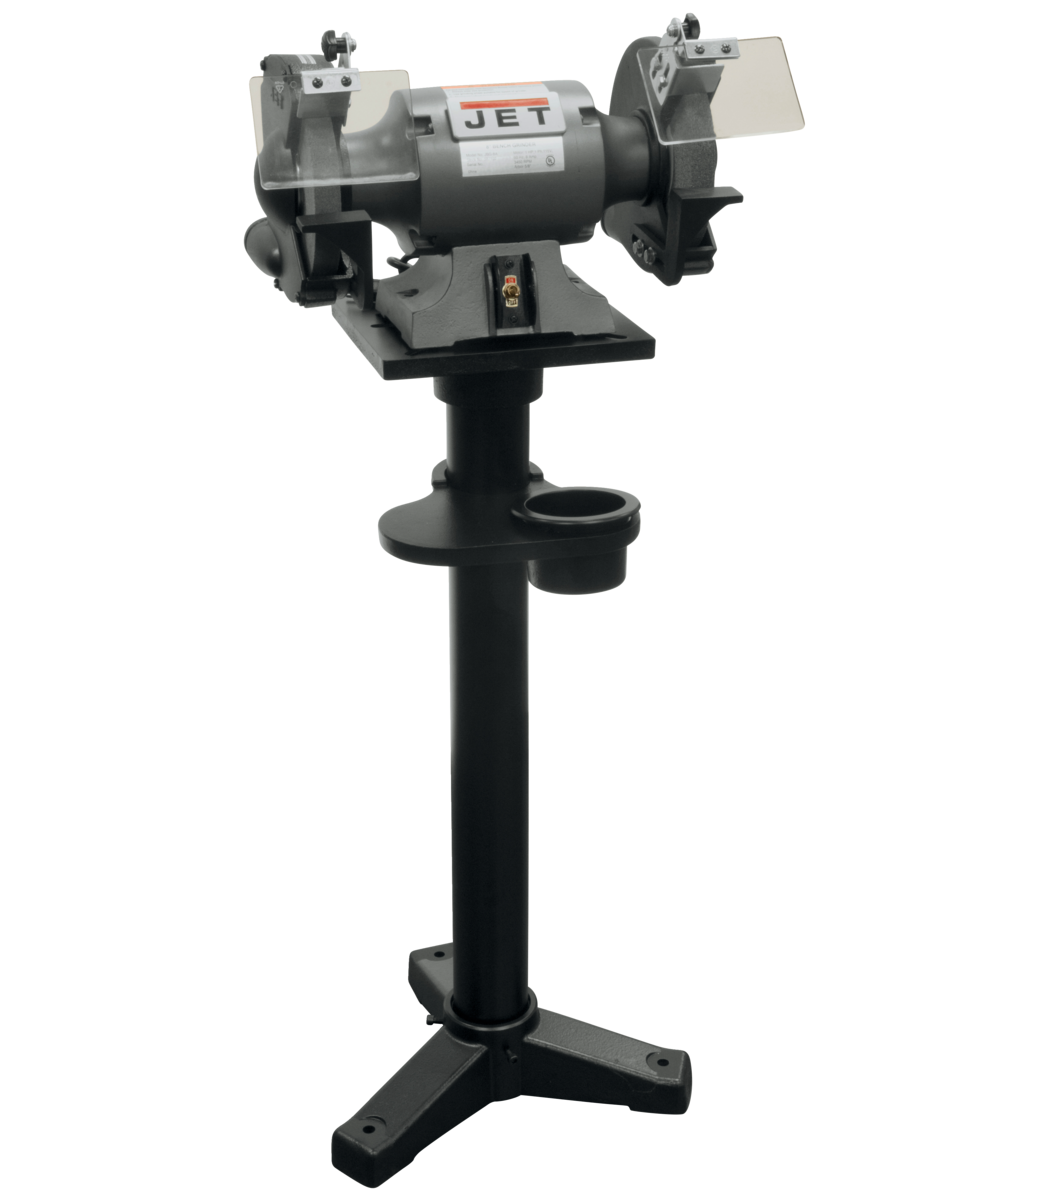 "JBG-8A/JBG-8B 8"" Shop Bench Grinder and JPS-2A Stand"